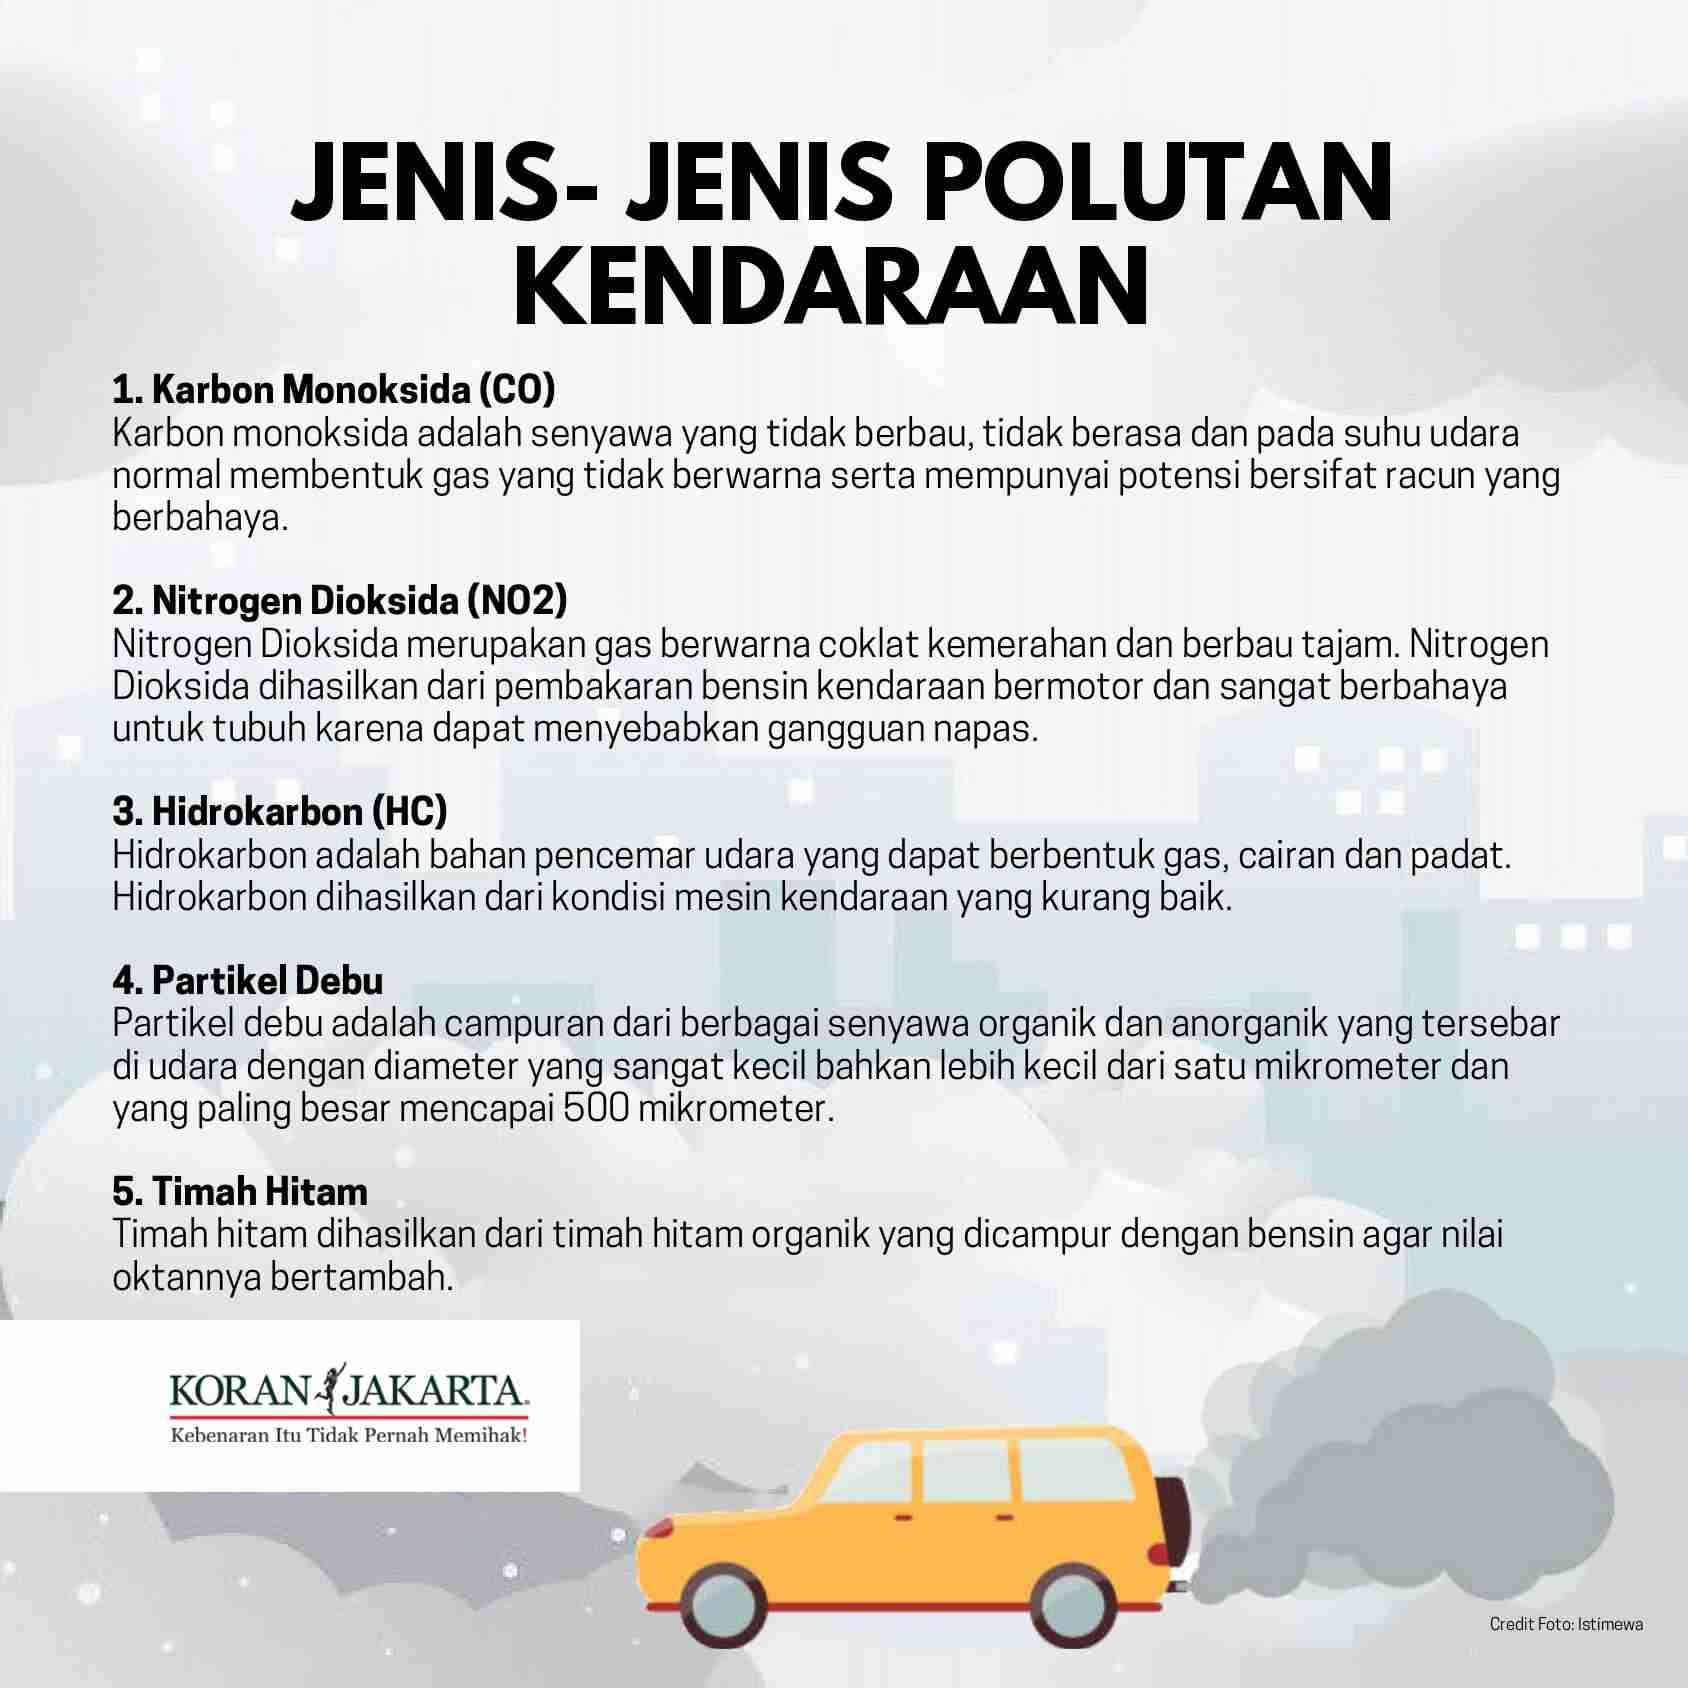 Dampak Polutan Kendaraan Bermotor 3